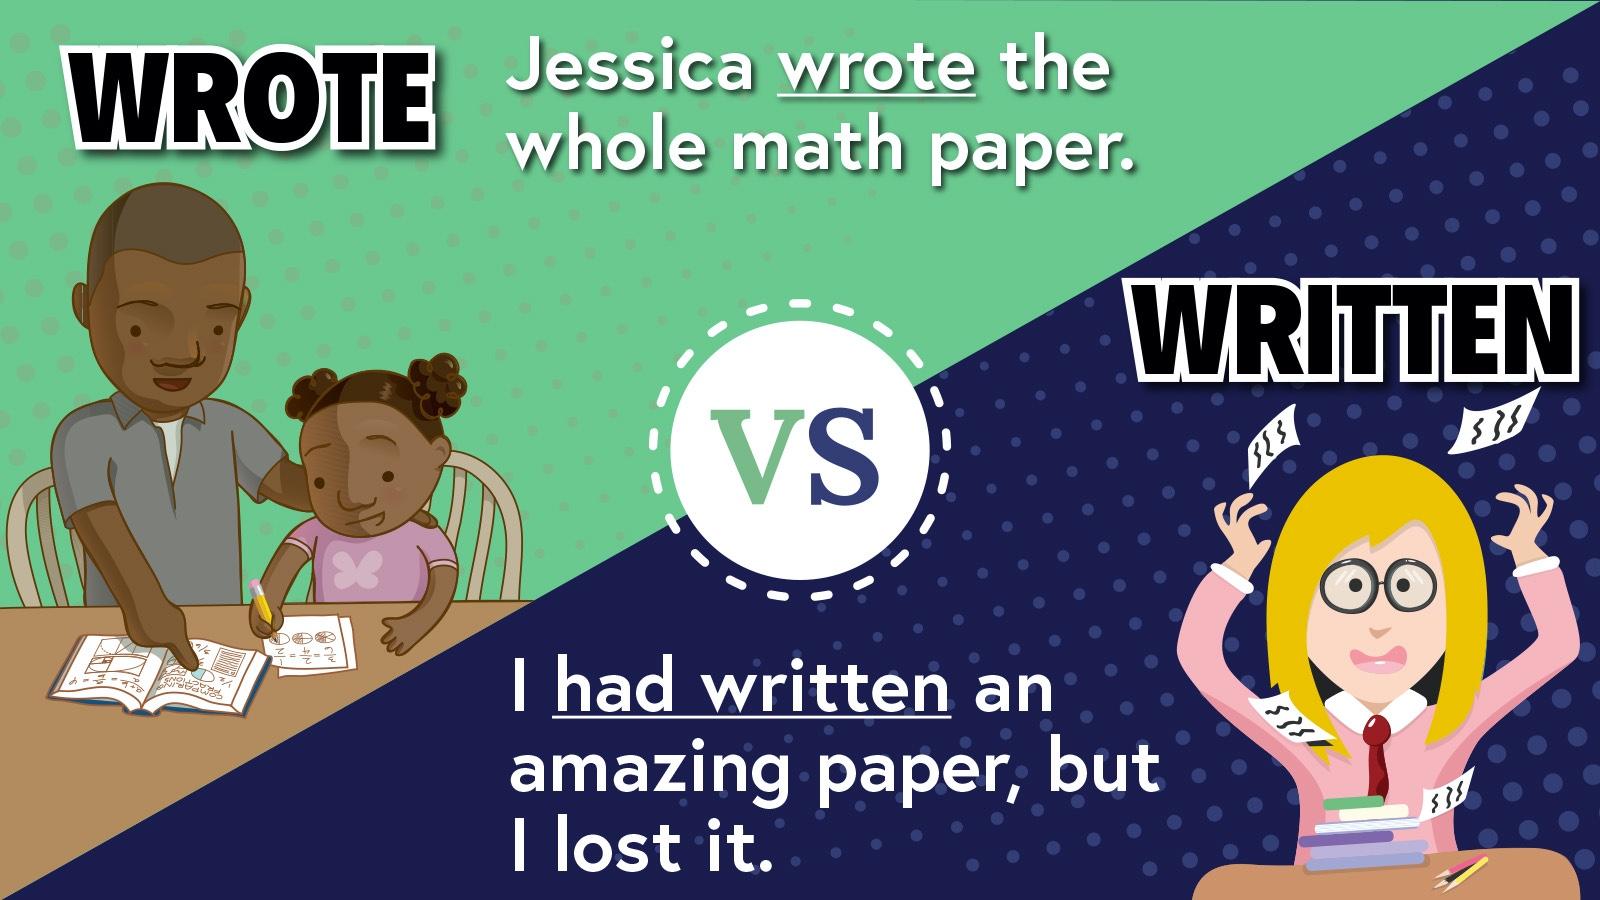 Wrote vs Written Example